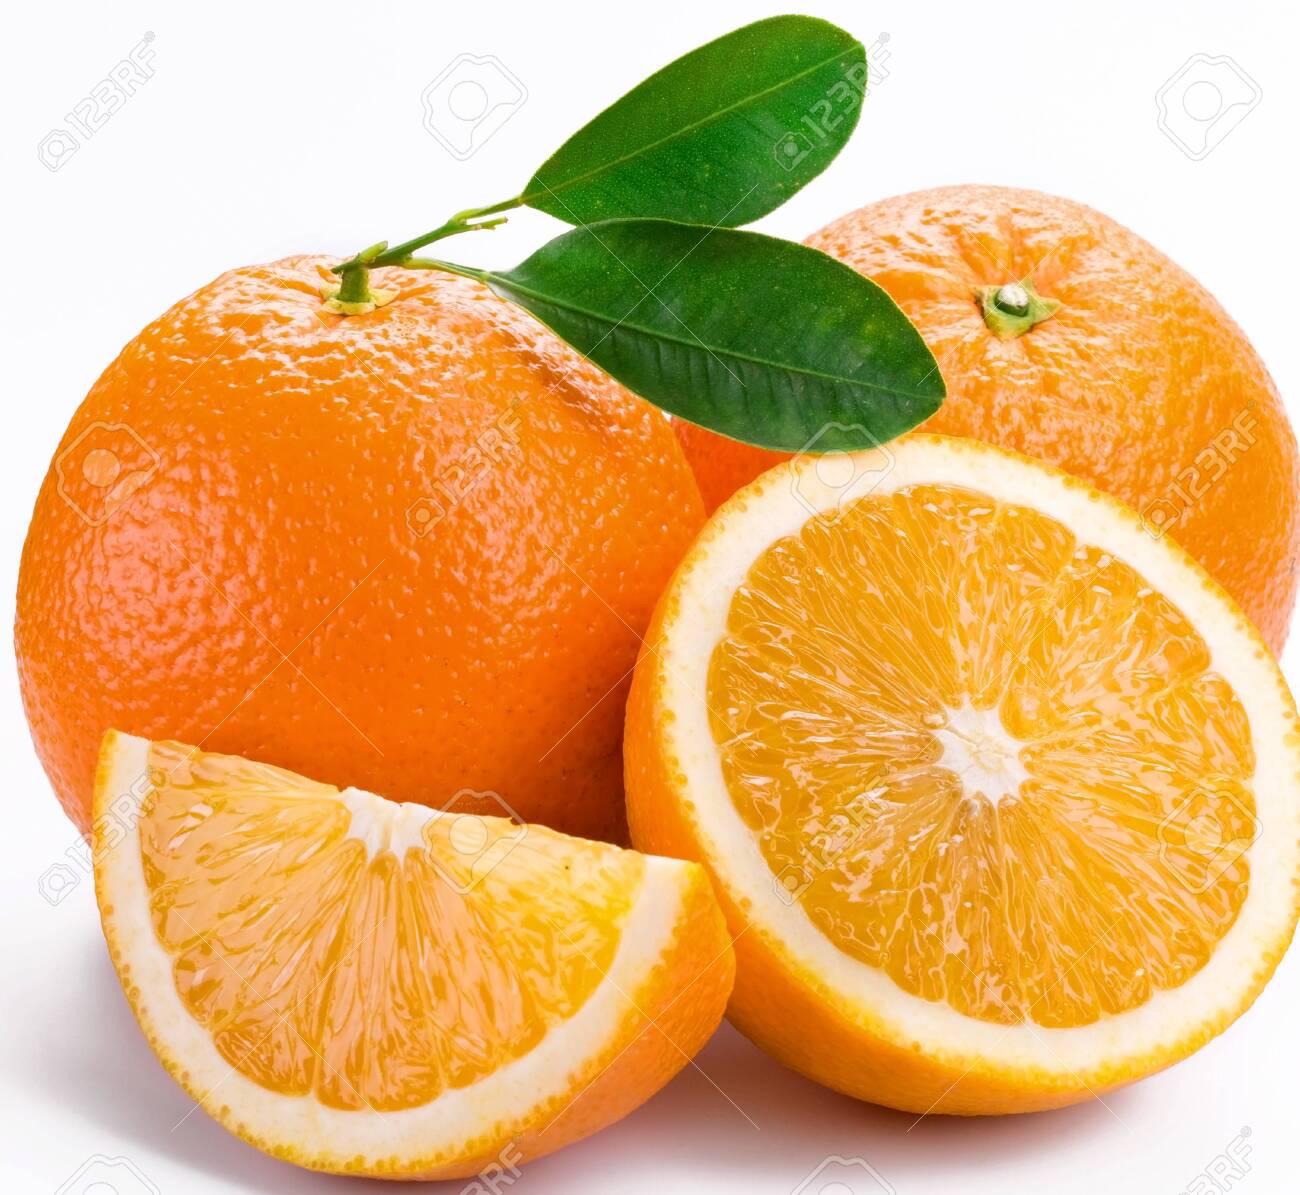 Oranges citrus half slice on a white background . - 130861541